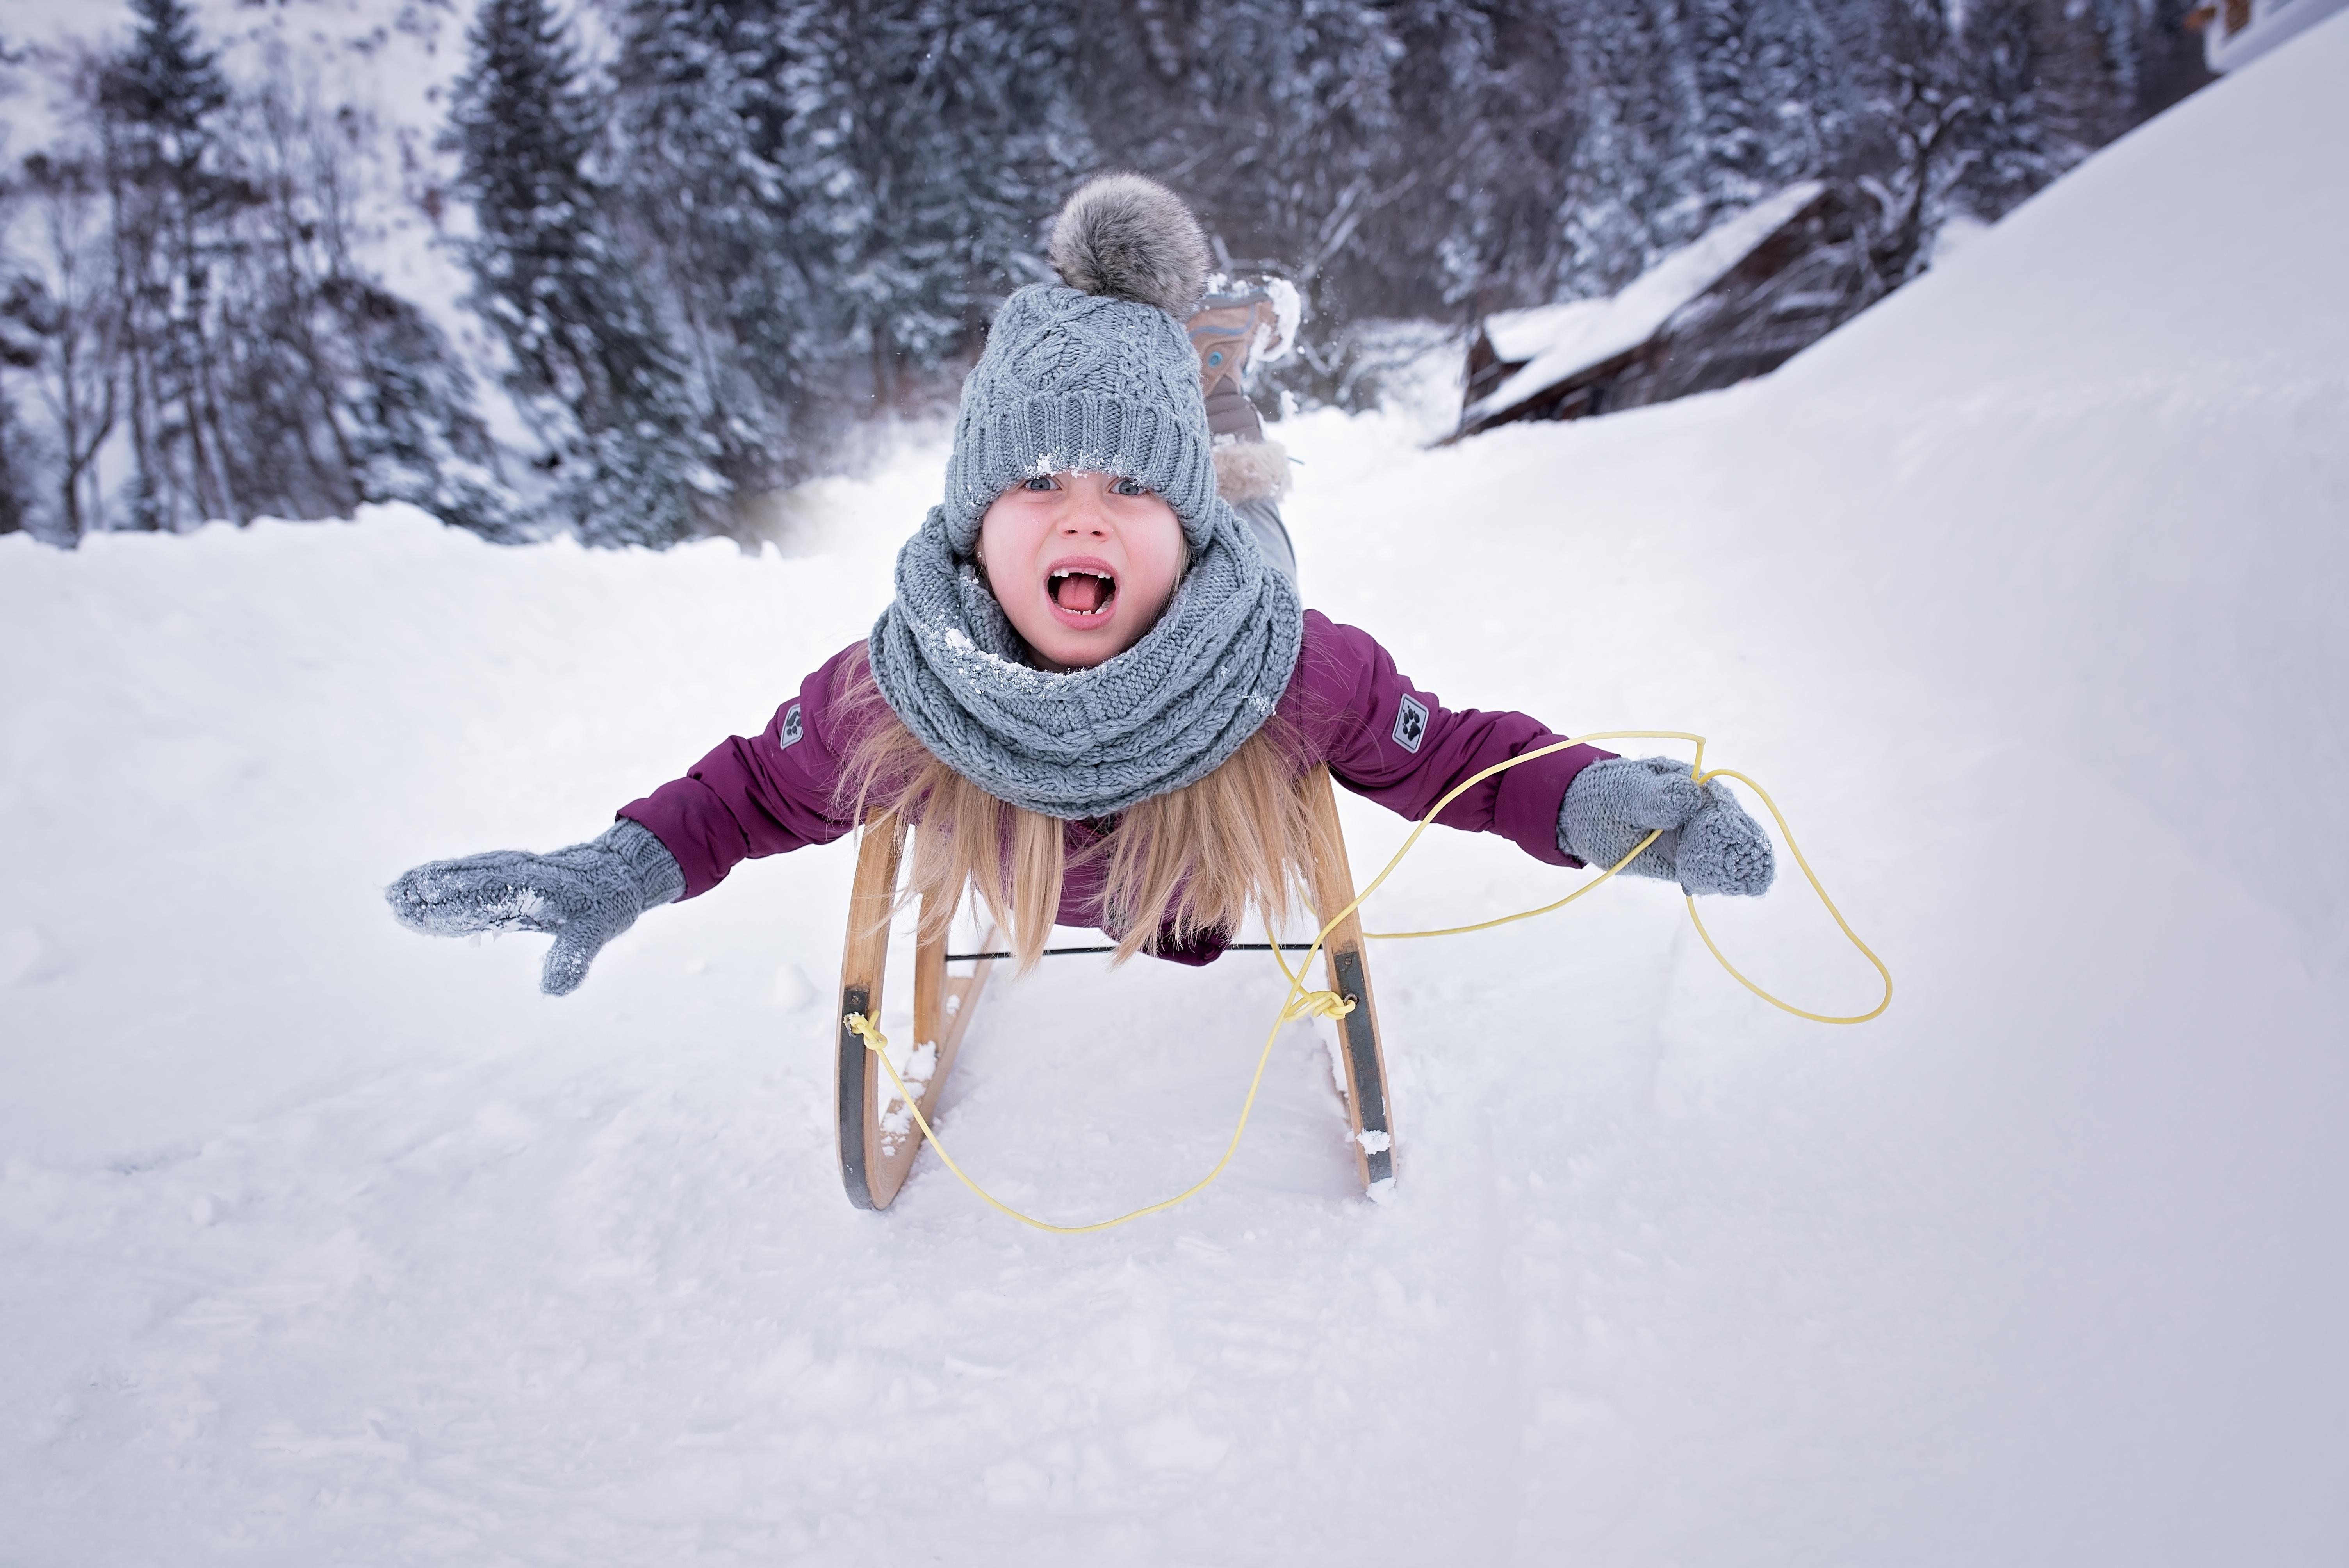 Gambar Orang Salju Musim Dingin Gadis Cuaca Anak Manusia